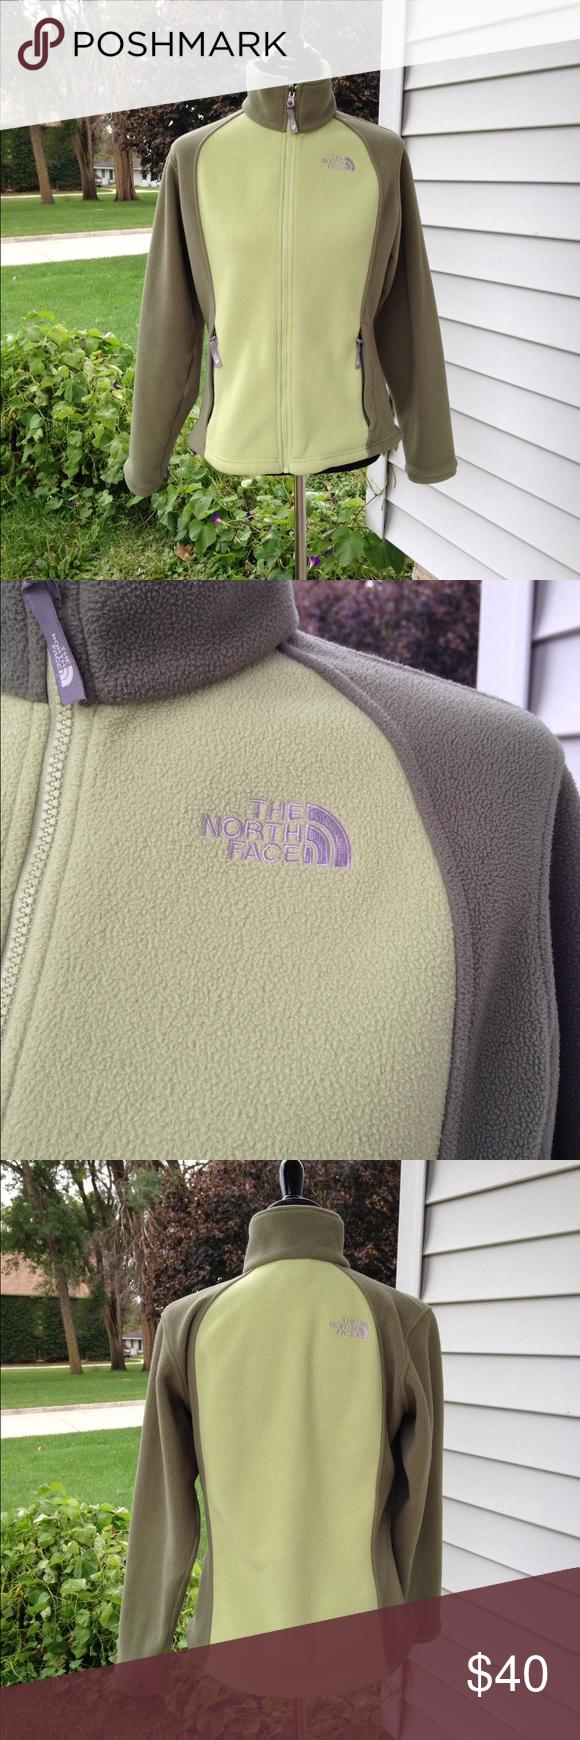 Women's north face fleece Women's 2 toned green north face full zip fleece. Good used condition. North Face Tops Sweatshirts & Hoodies